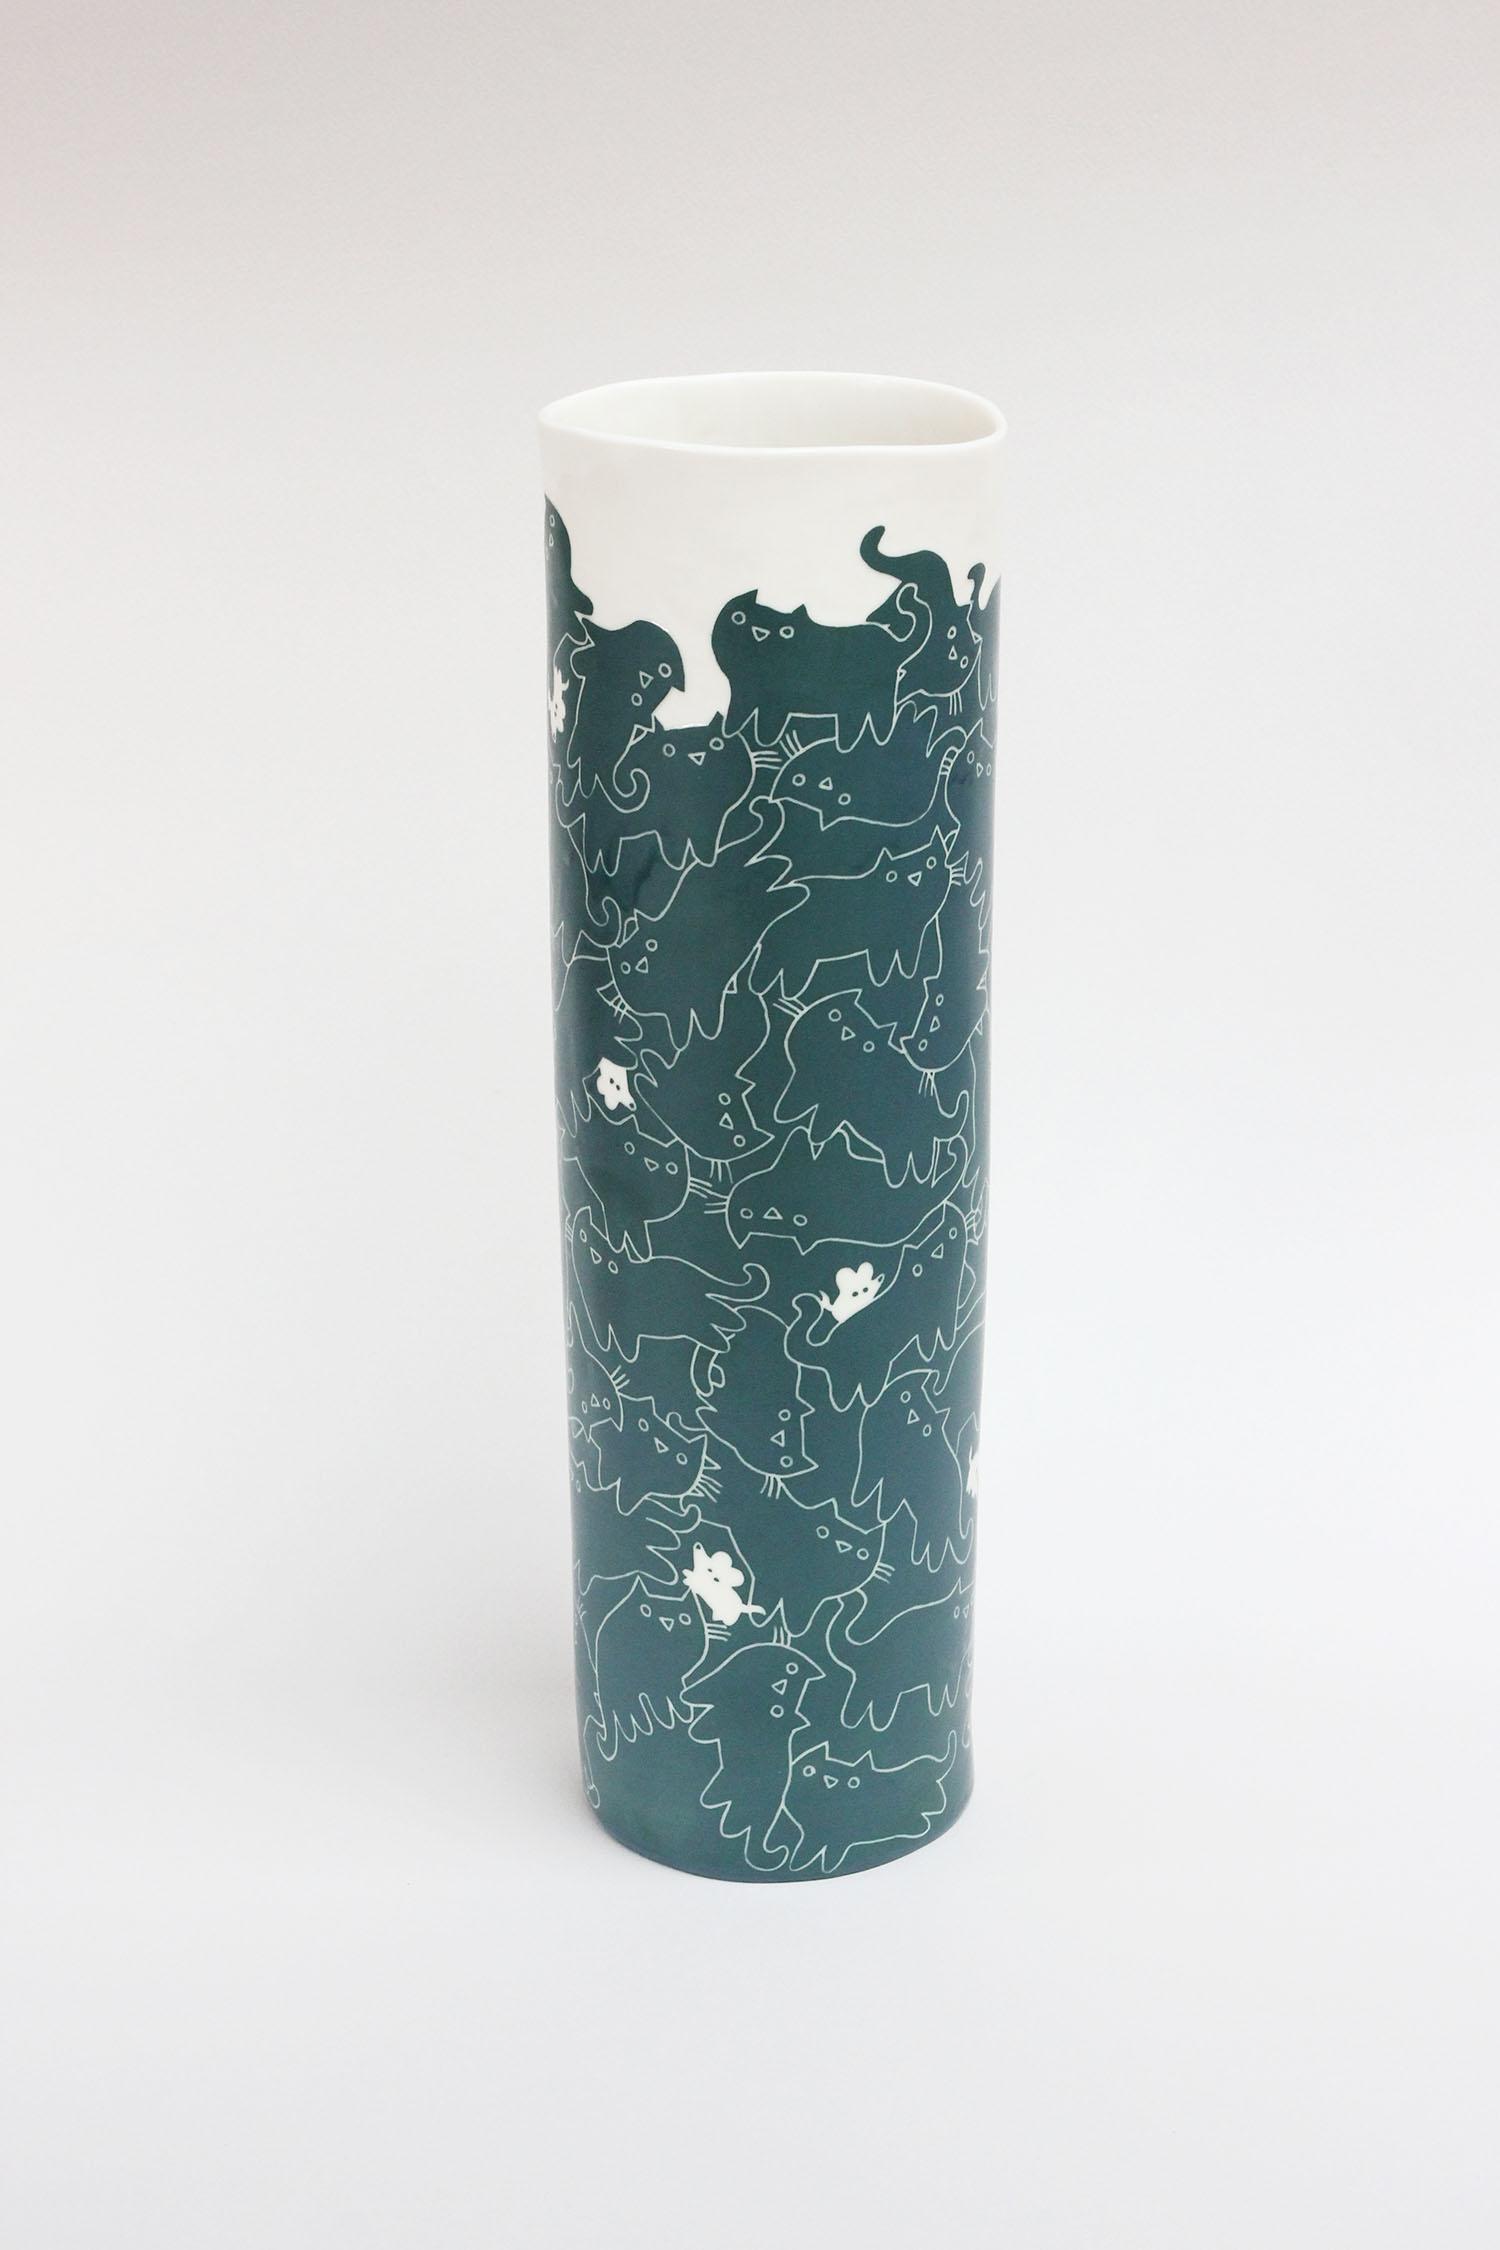 Vase entrechats Charlotte Heurtier 2017.jpg